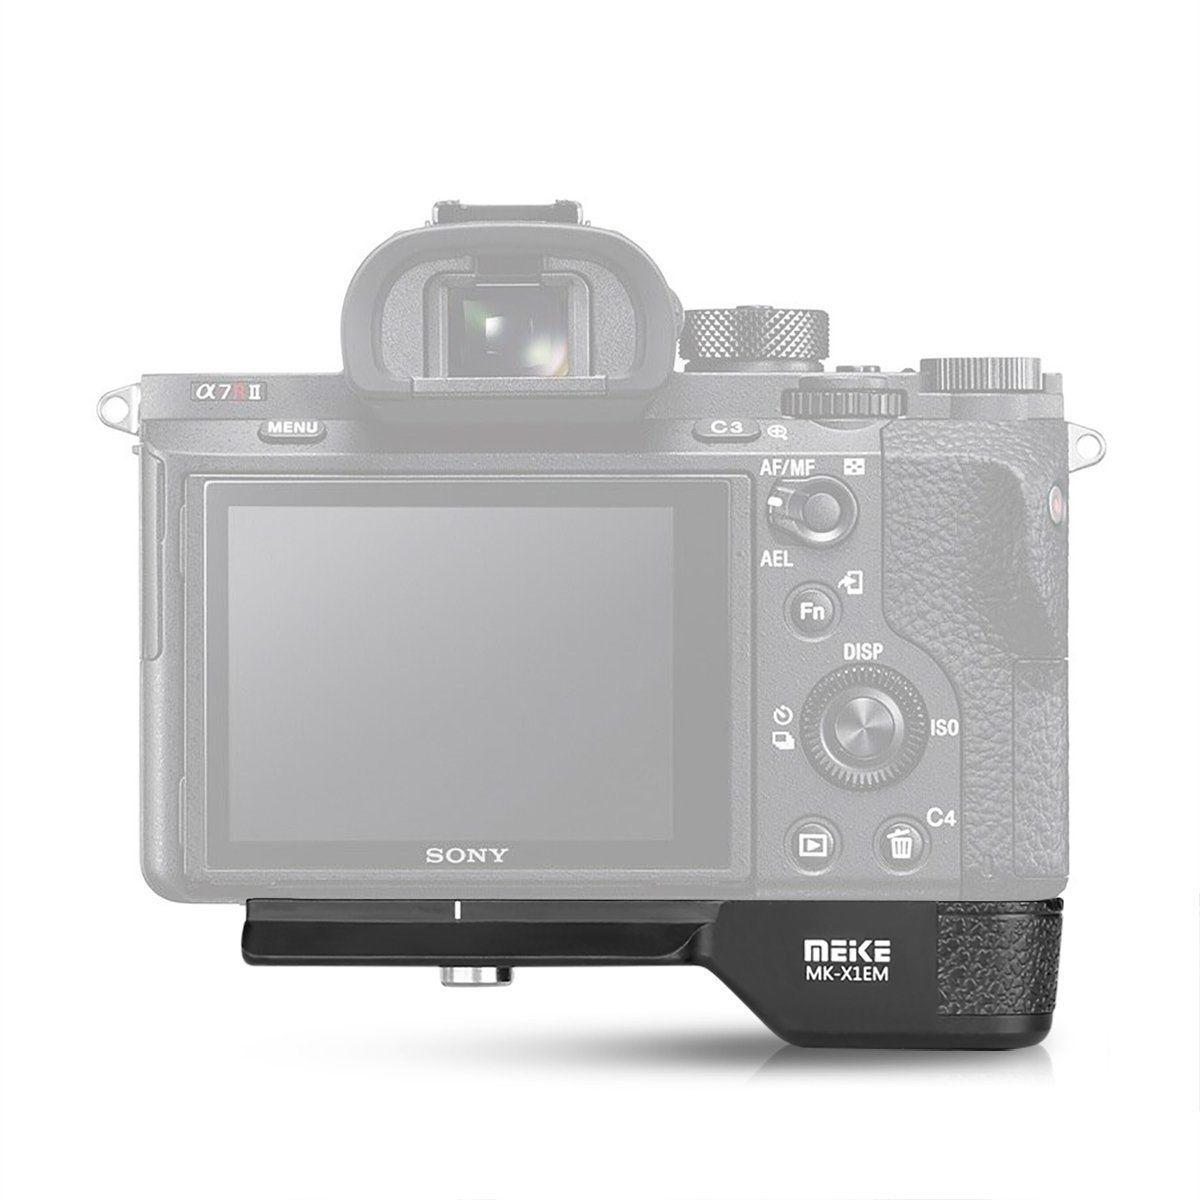 Meike Hand Grip MK-X1EM for Sony A9 A7MIII A7RIII A7RII A7II A7SII Cameras